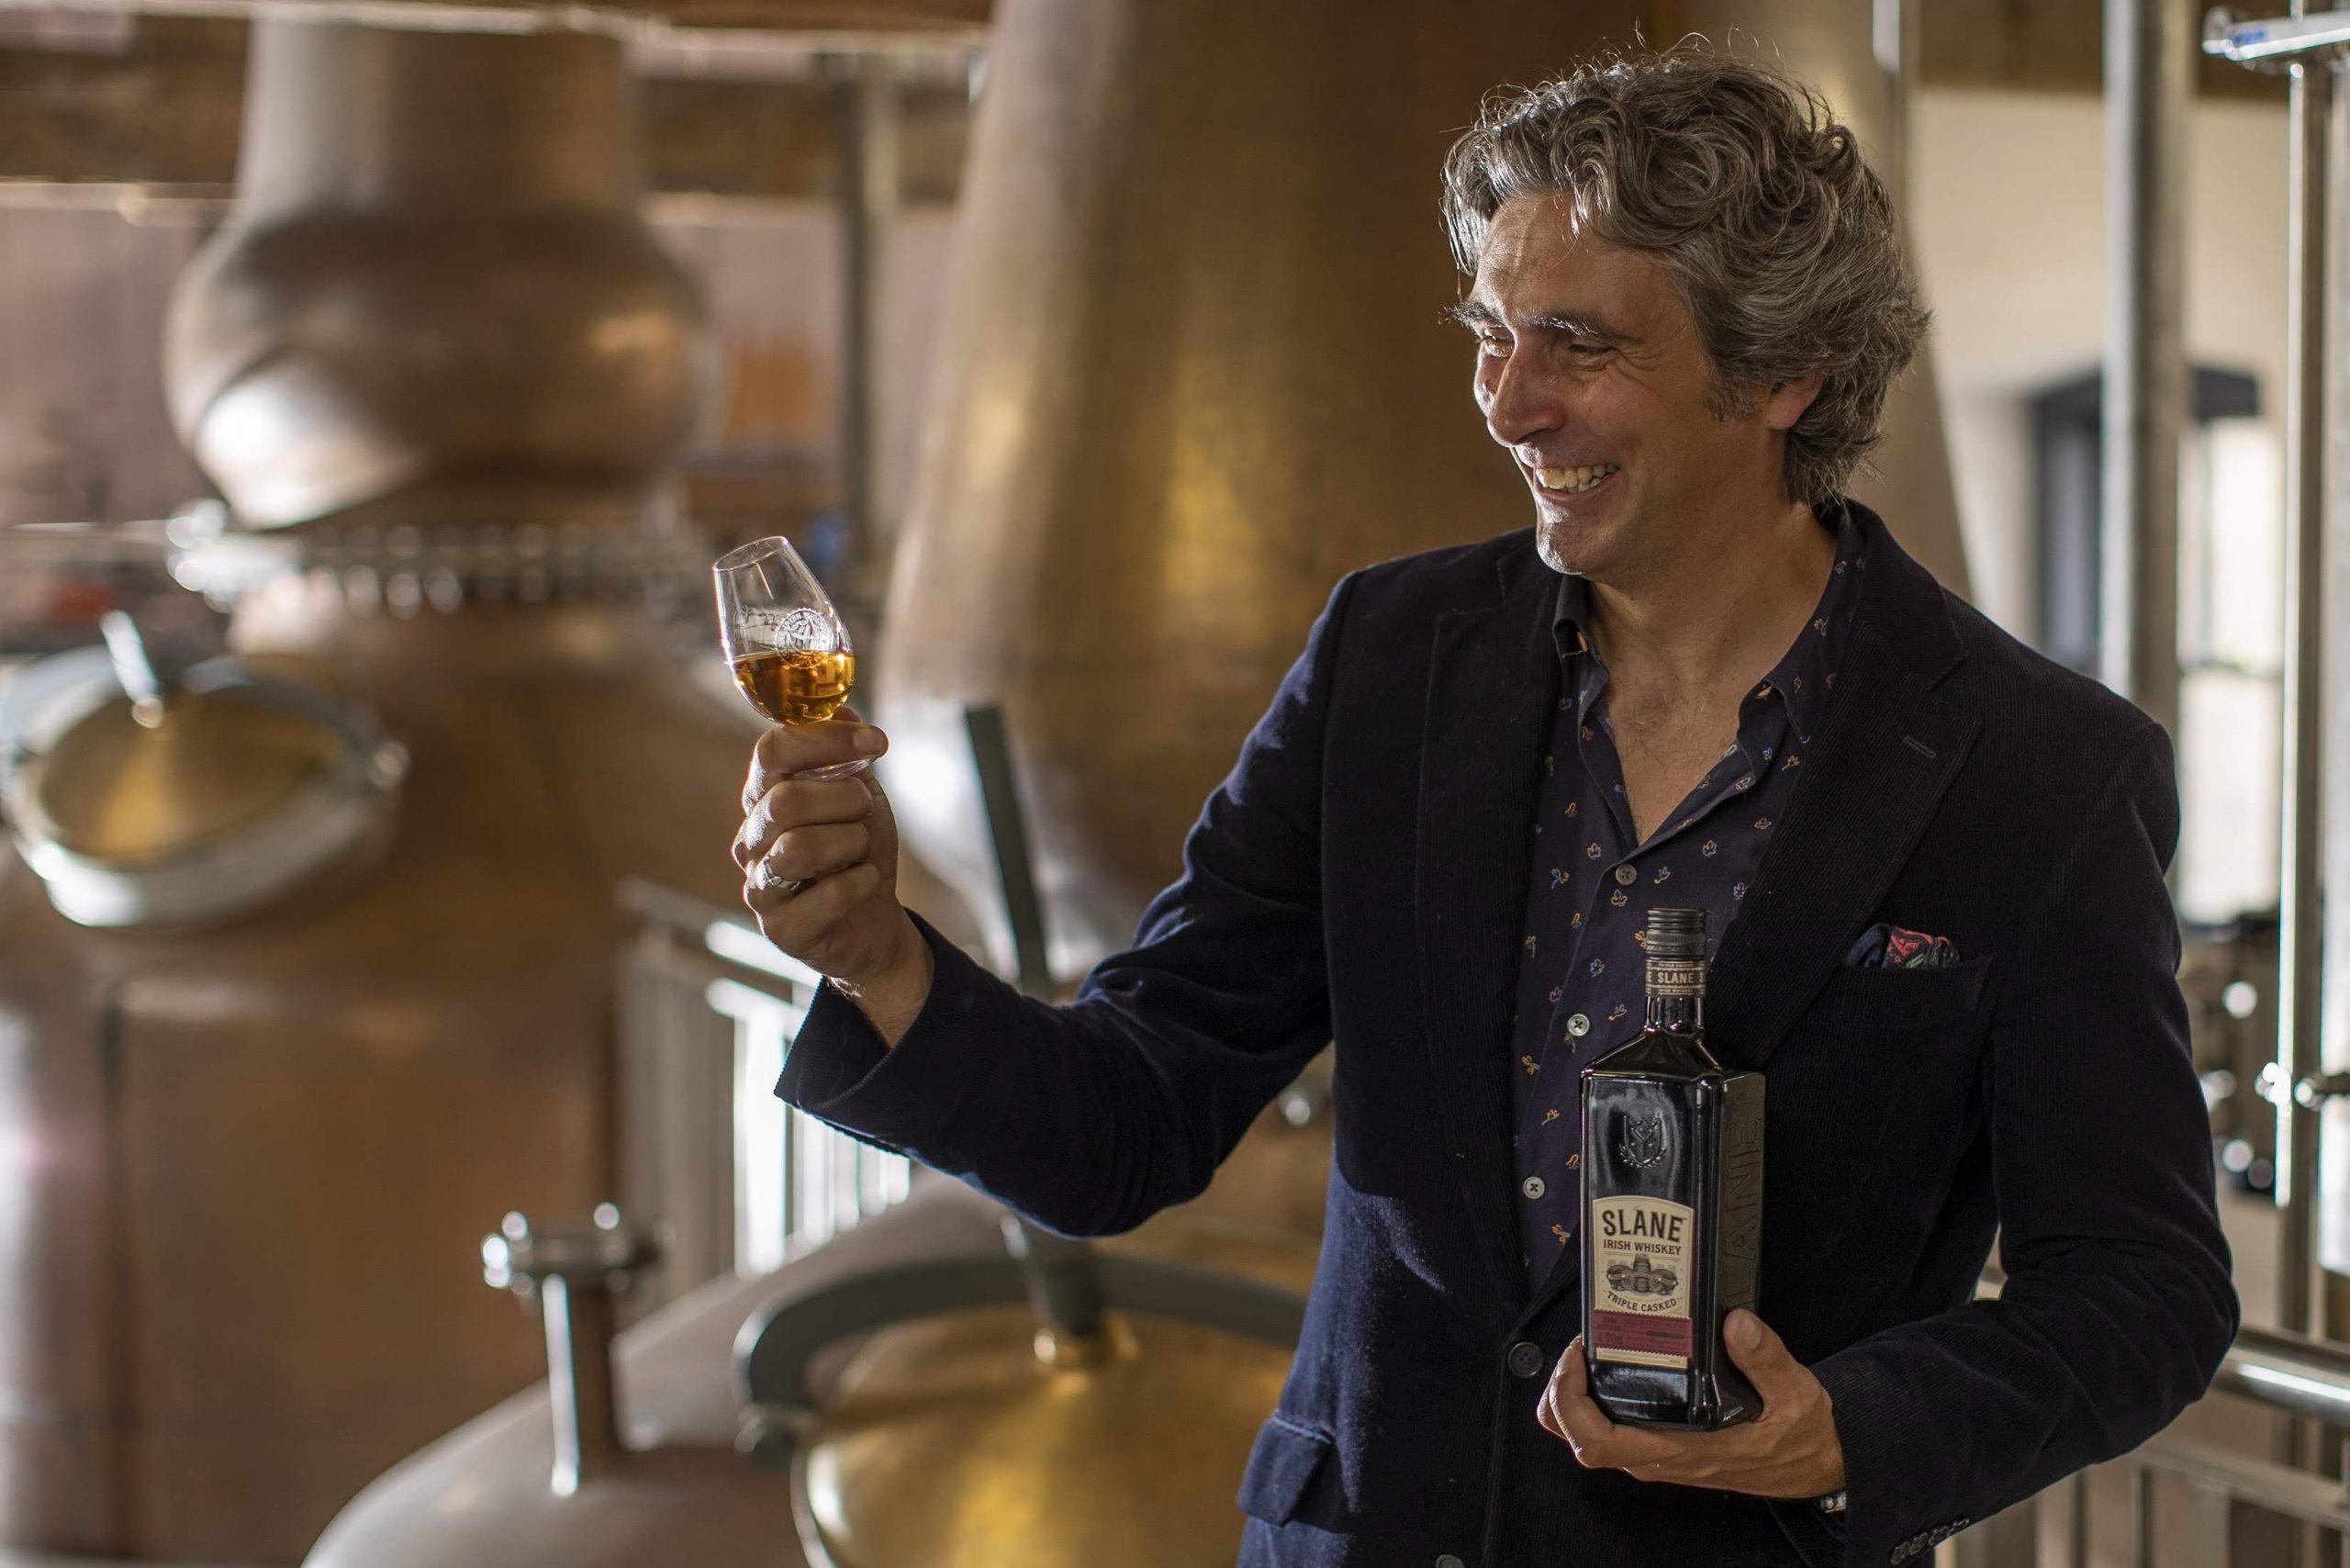 Slane Distillery won't let Covid dampen spirits for St Patrick's